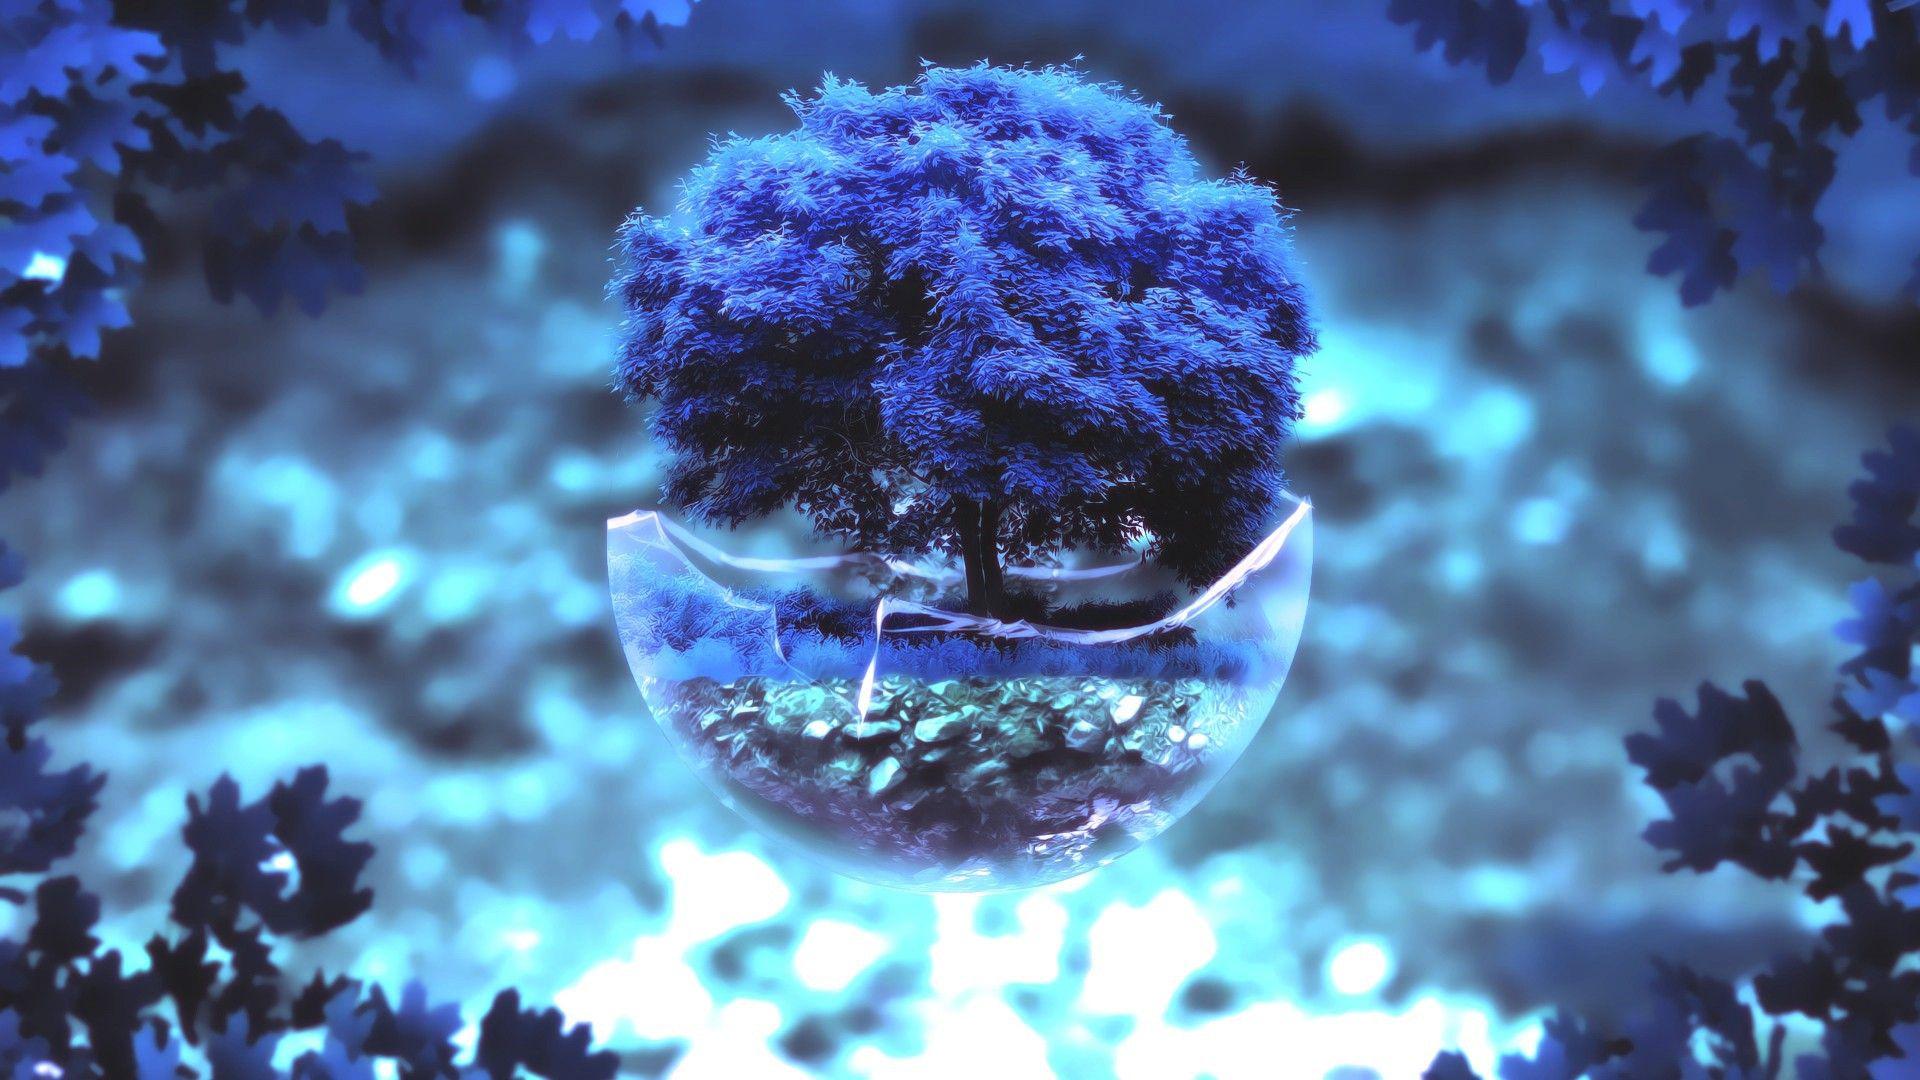 Different Bonsai Tree Blue Tree Desktop Wallpaper, Pictures, Photos